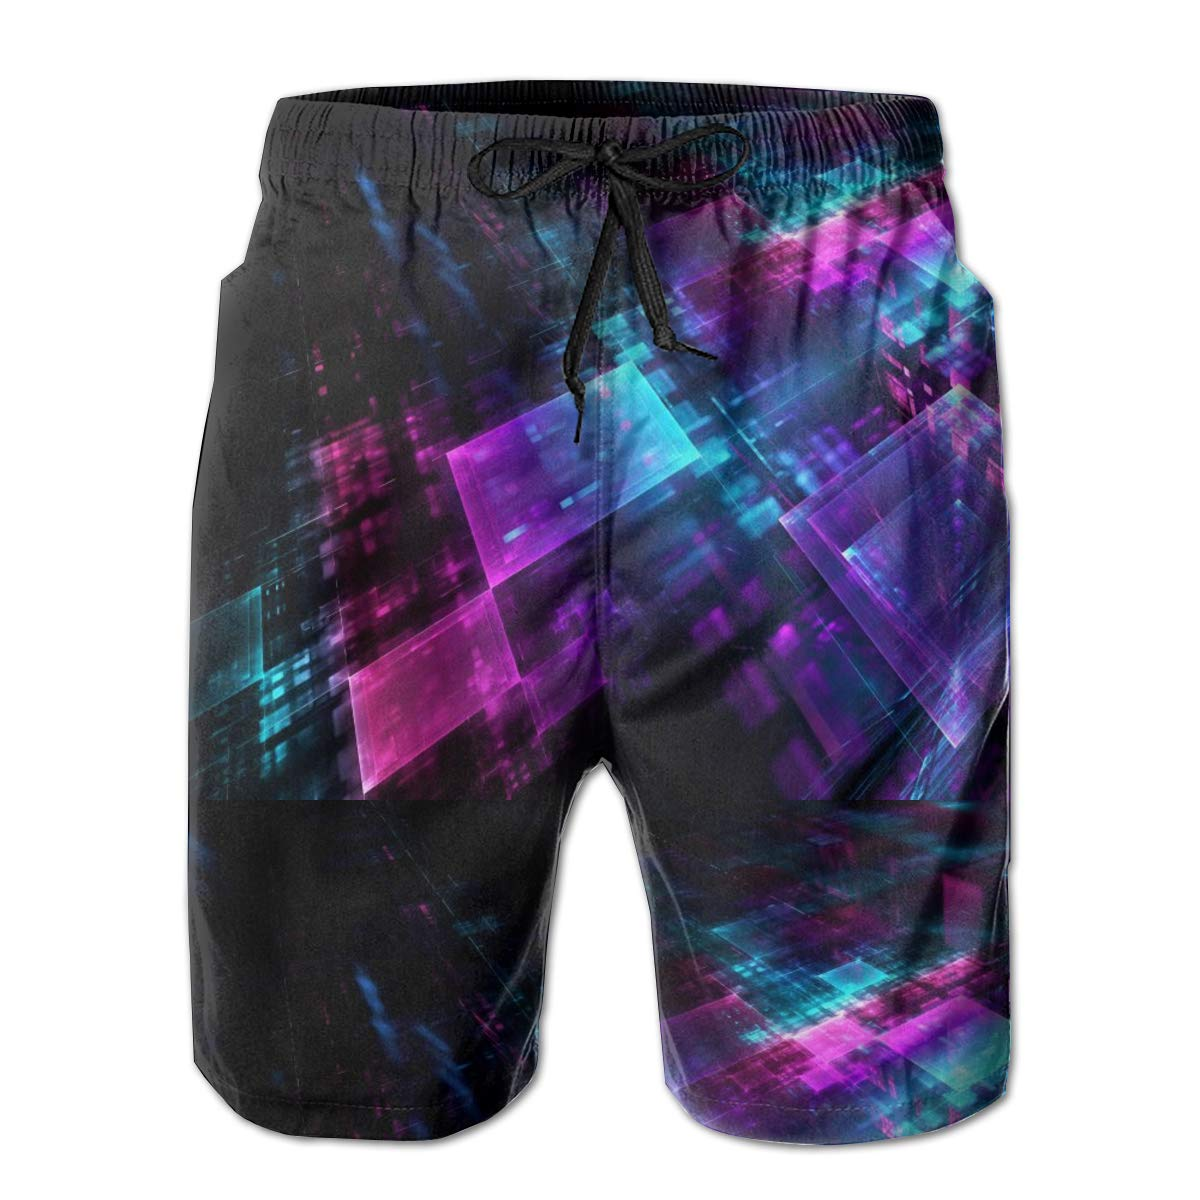 Jngjs Summer Holiday Beach Board Shorts with Drawstring Beach Pants